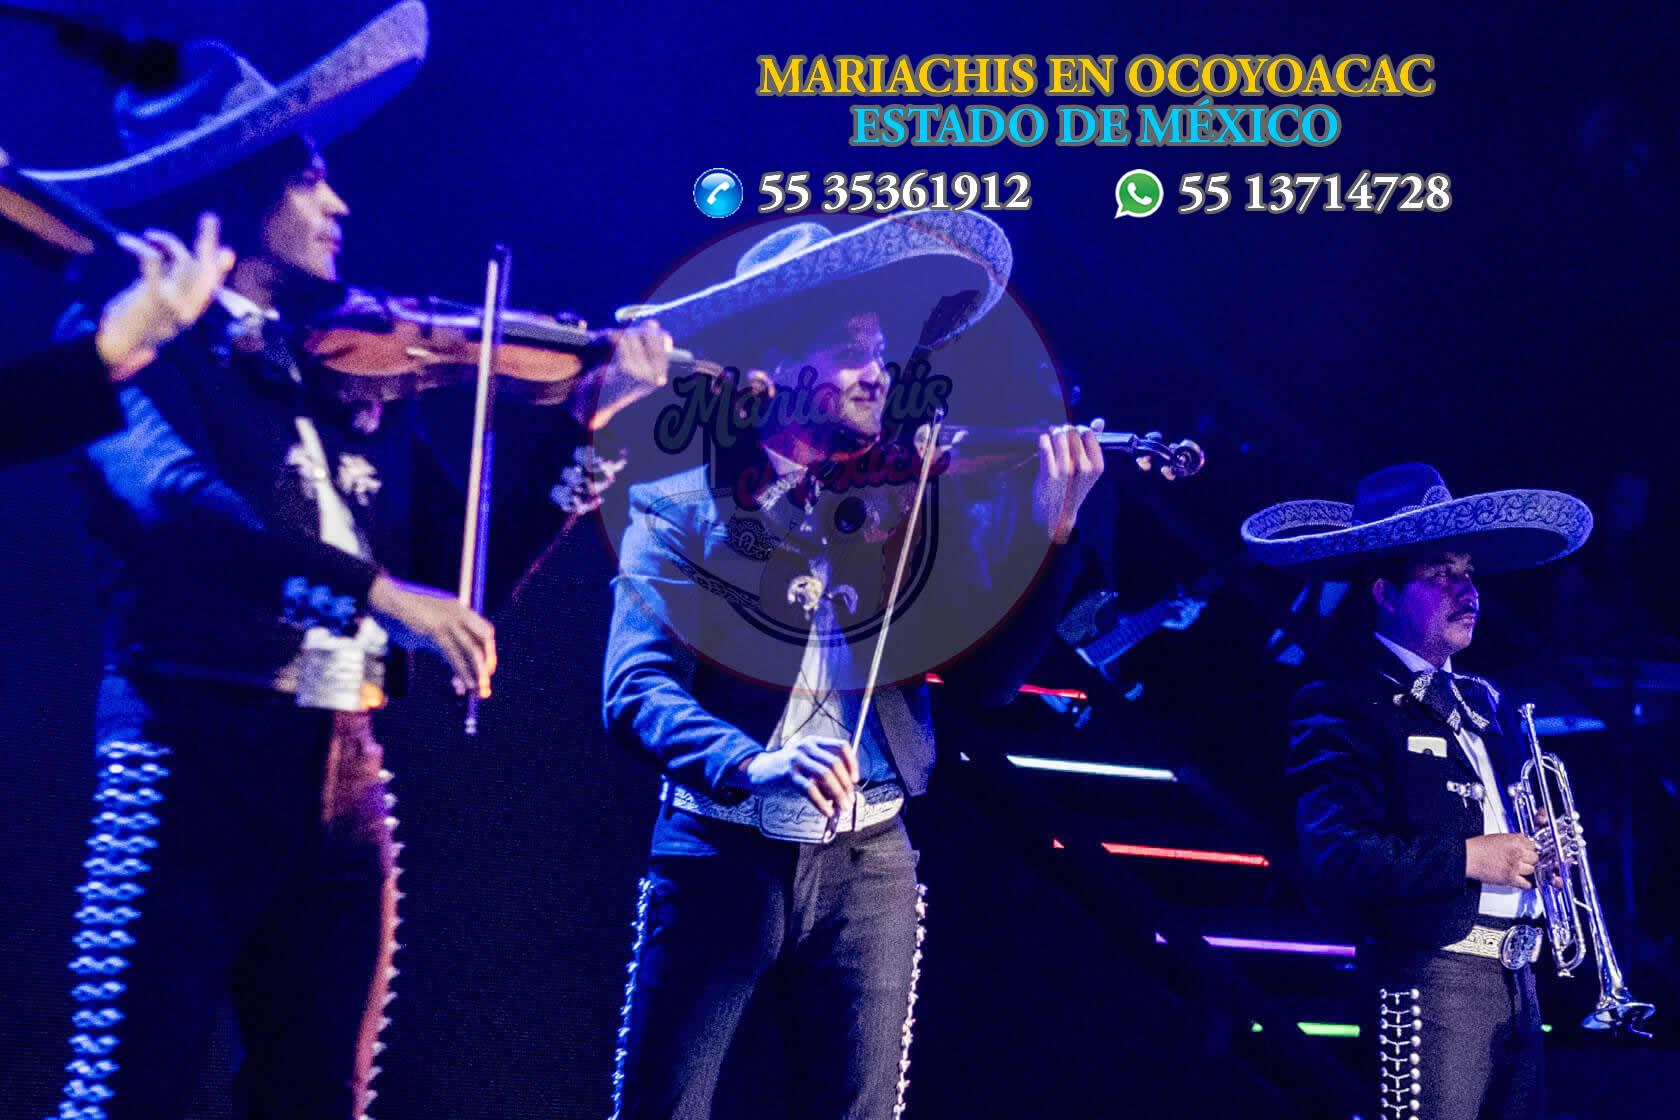 Mariachis en Ocoyoacac